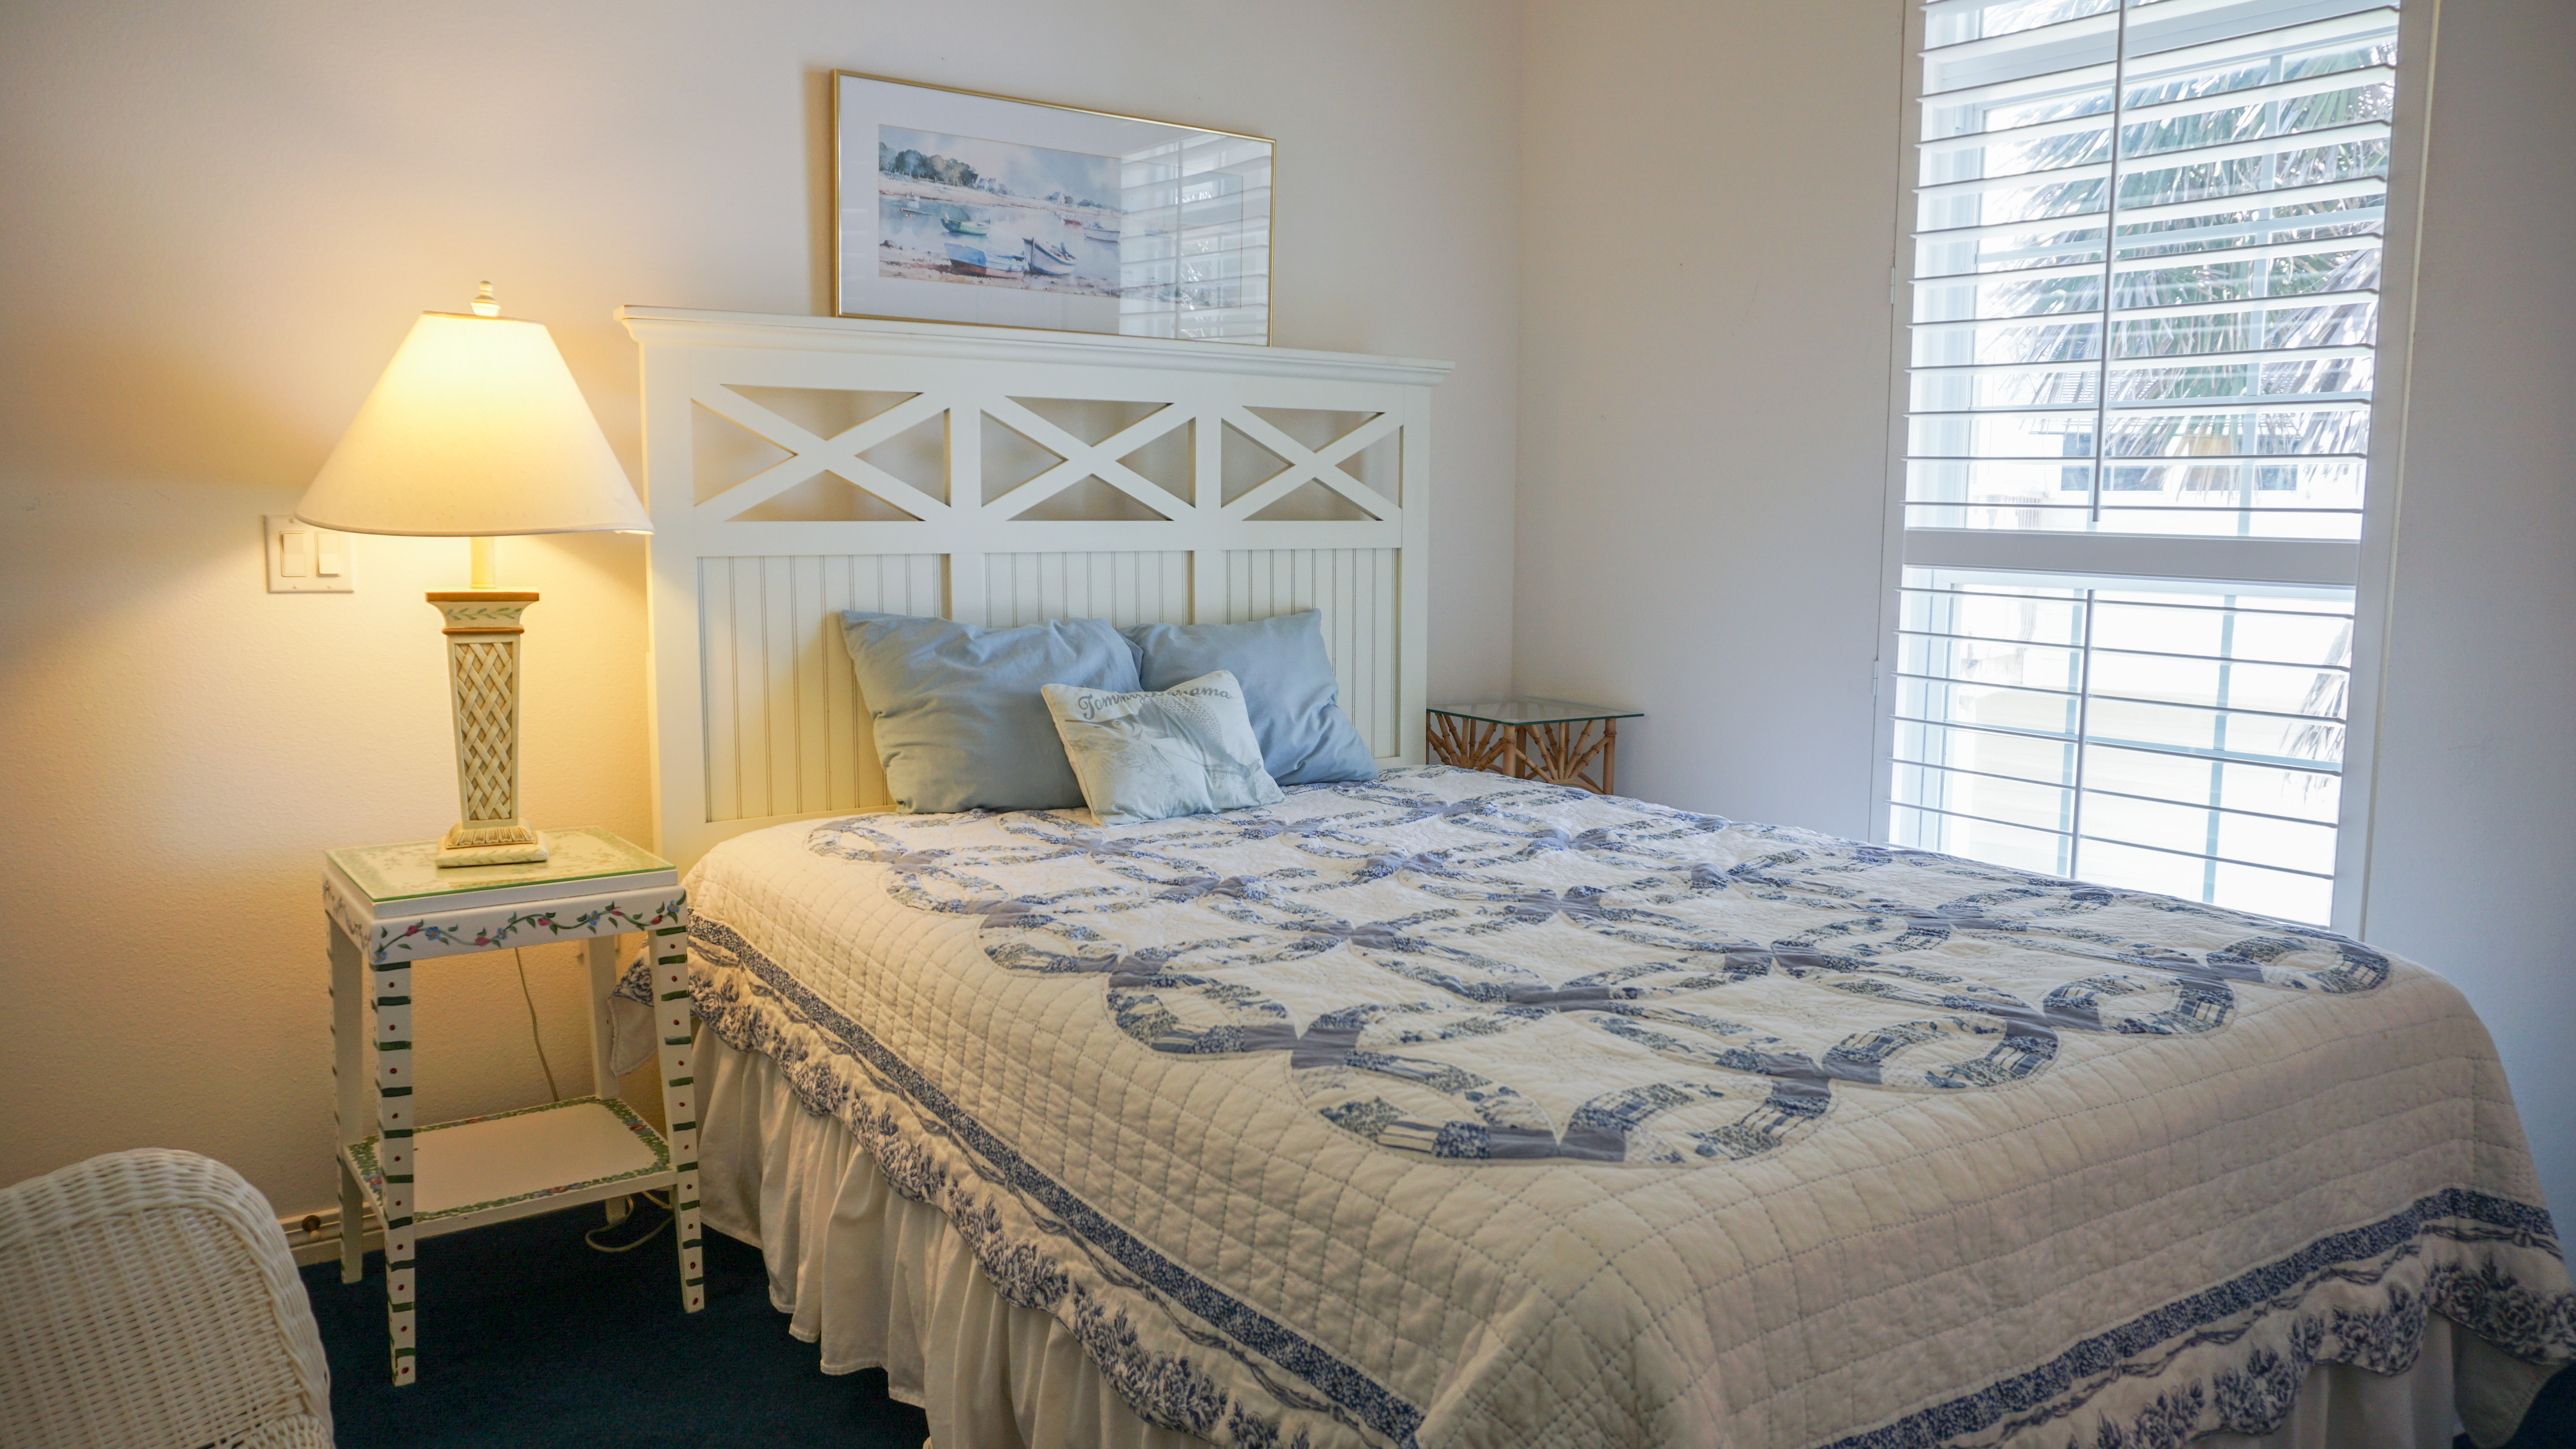 Ensenada Cinco 1730 House/Cottage rental in Pensacola Beach House Rentals in Pensacola Beach Florida - #29